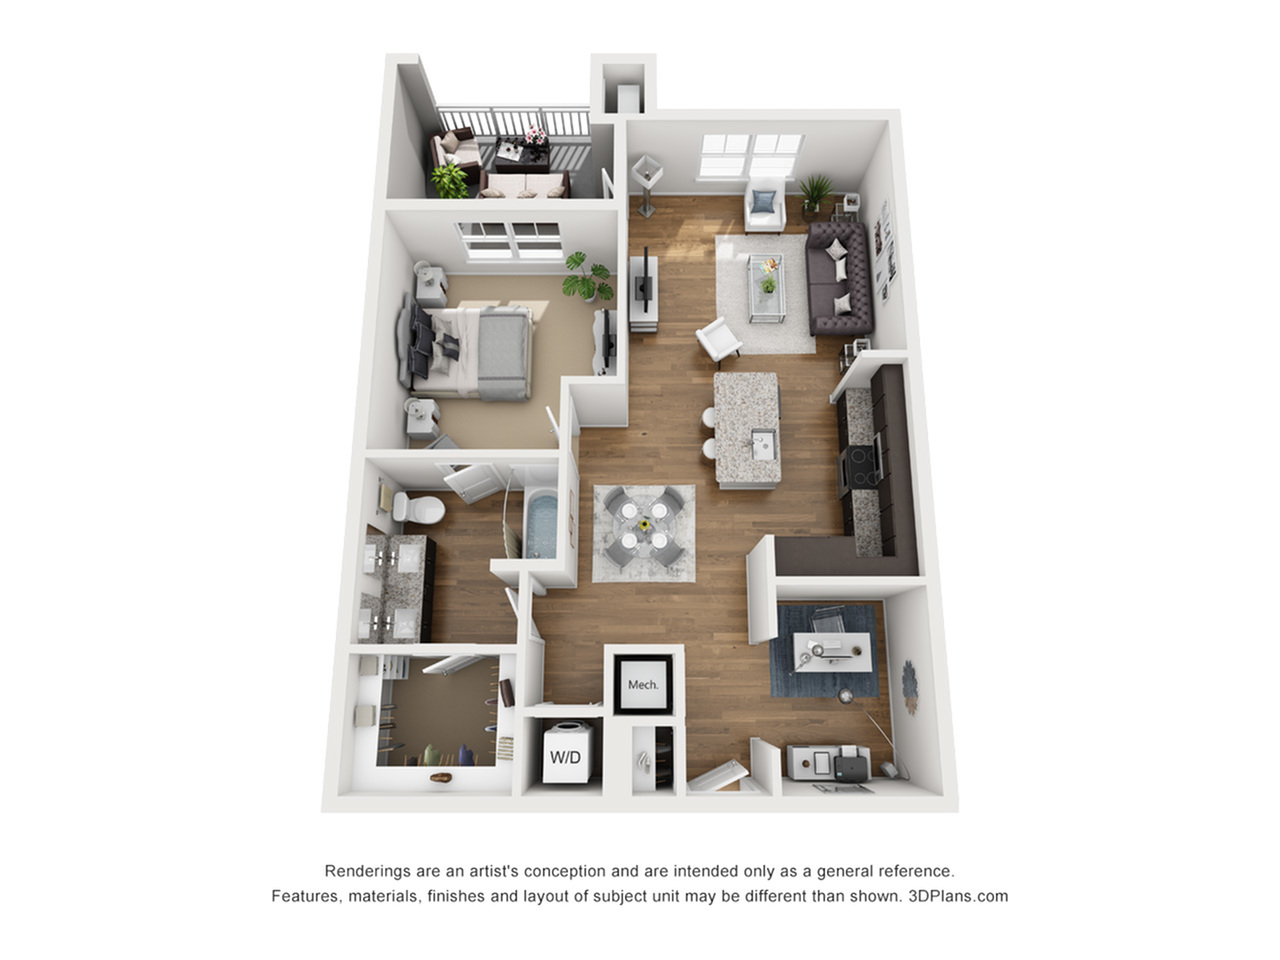 A4D Floor Plan Image